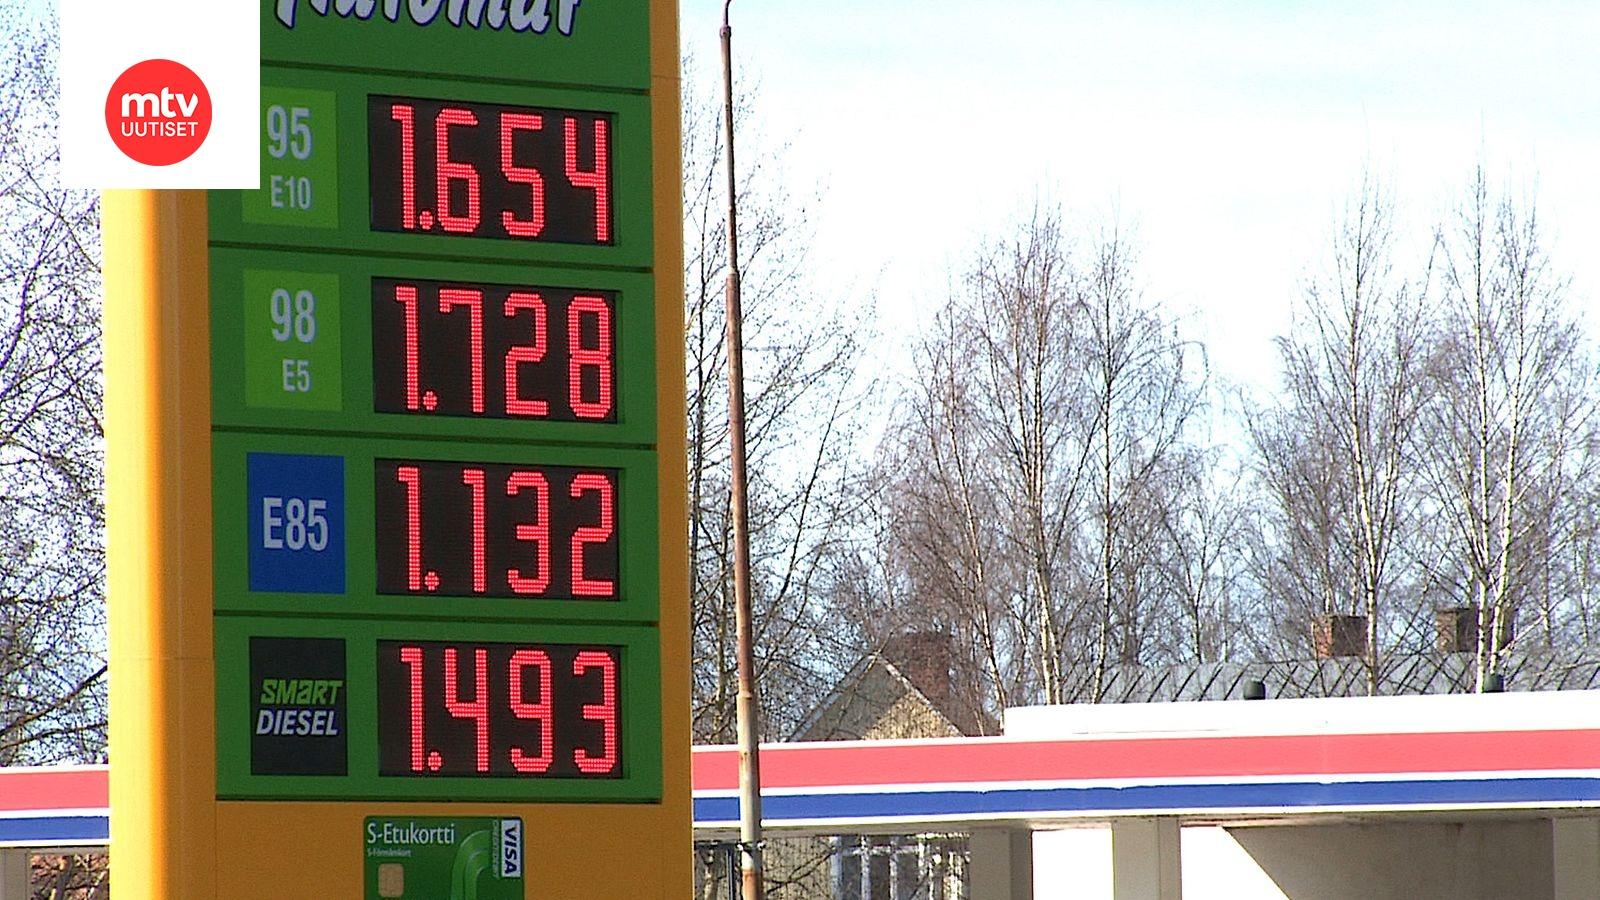 E85 Gas Stations >> Bensan Litrahinta Nousi Nopeasti Paikoin Jopa 10 Sentilla